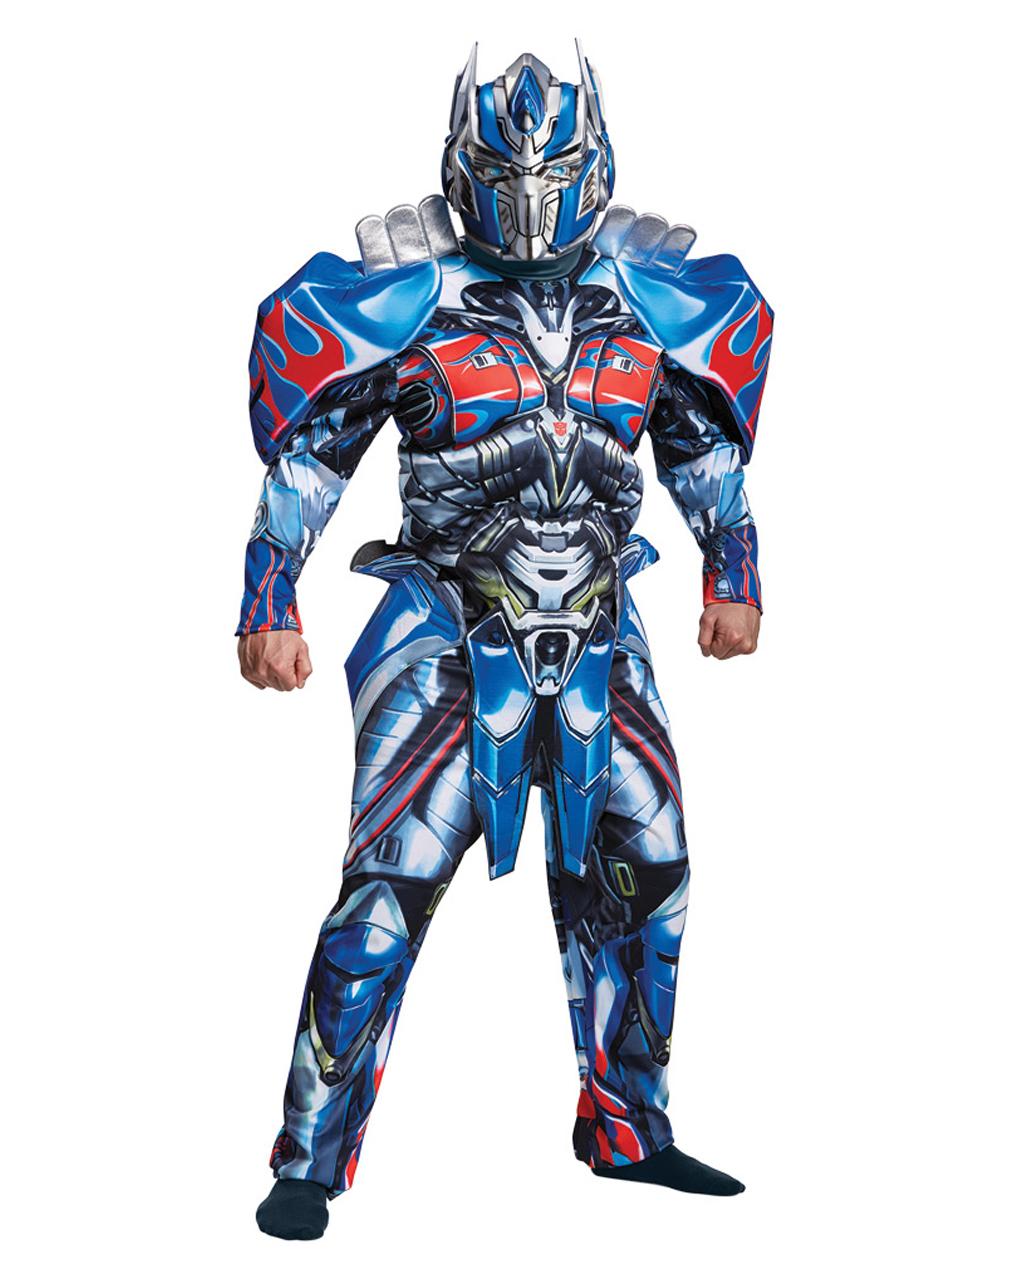 Transformers Optimus Prime Muskelkostüm Deluxe